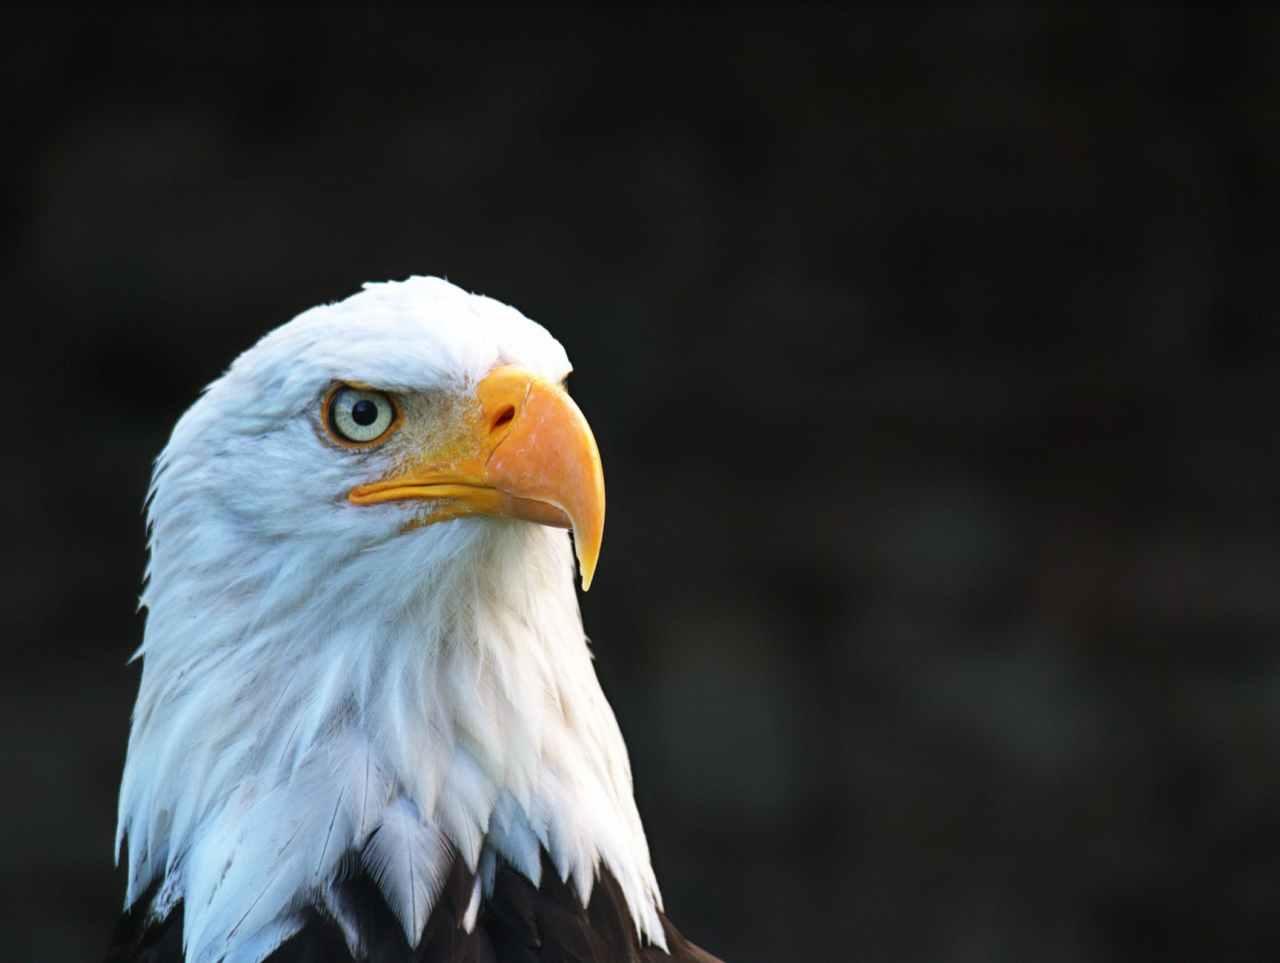 american eagle photo